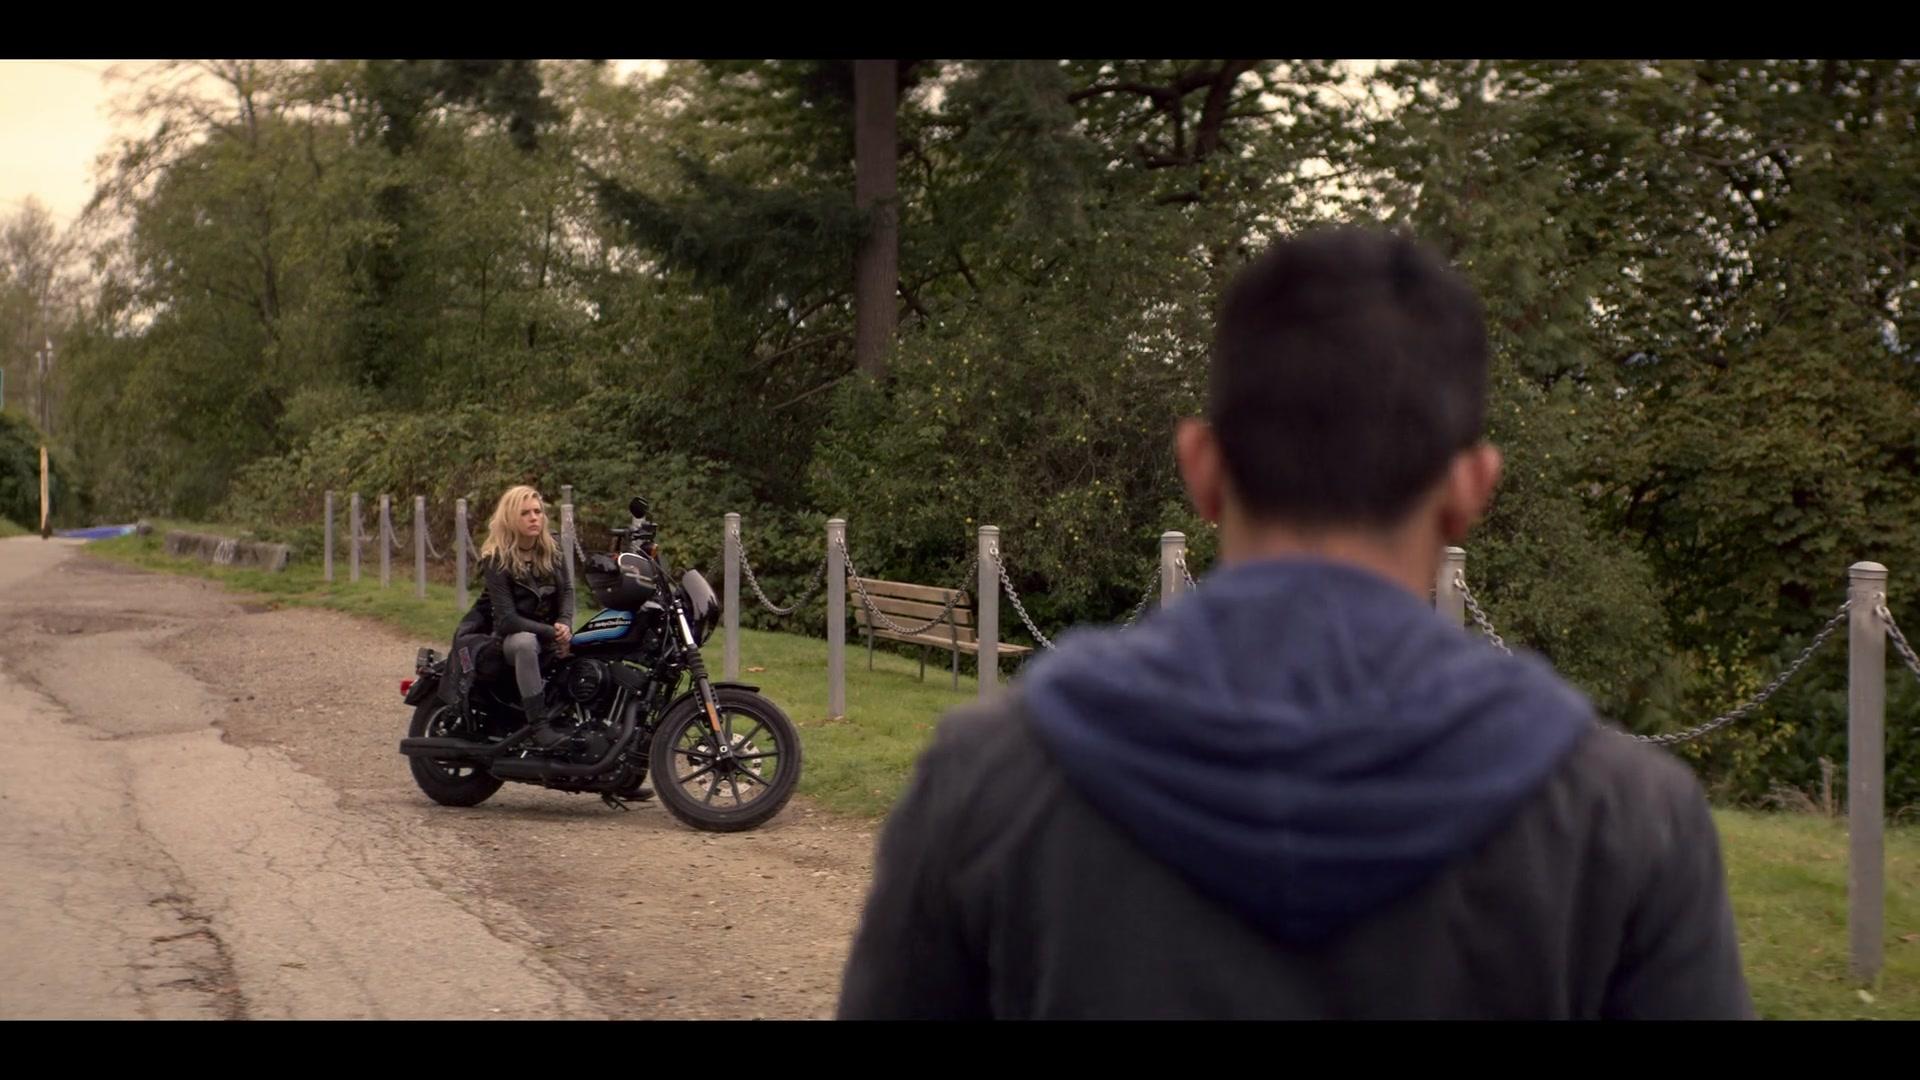 Used Harley Davidson Motorcycles >> Harley Davidson Motorcycle Used By Katheryn Winnick In Wu